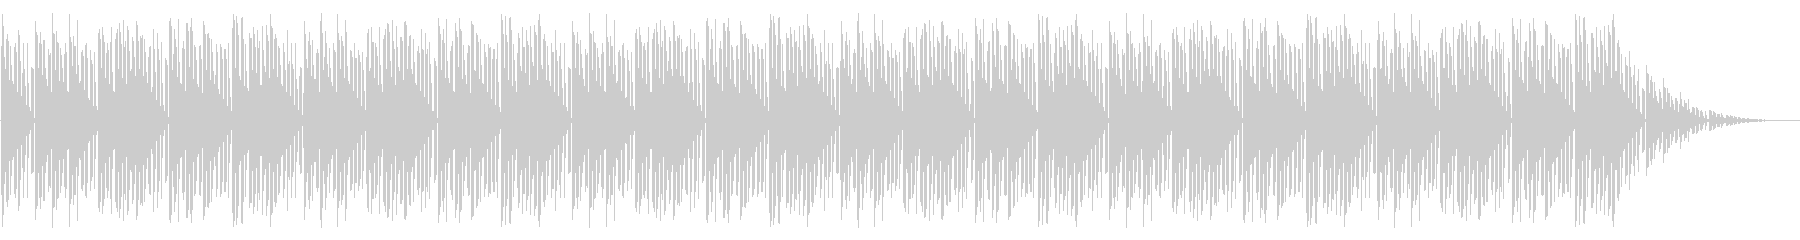 GB風アクションゲームのOP曲の未再生の波形